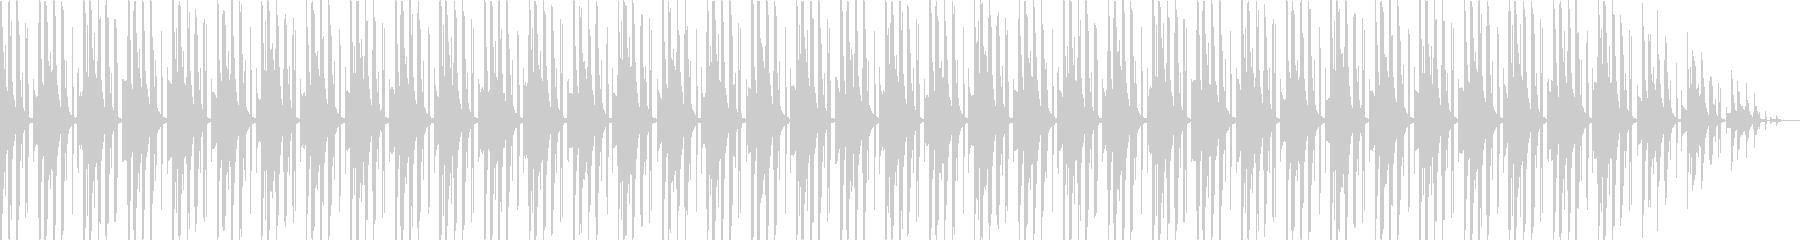 VP・日常シーンに 少しコミカルなテクノの未再生の波形